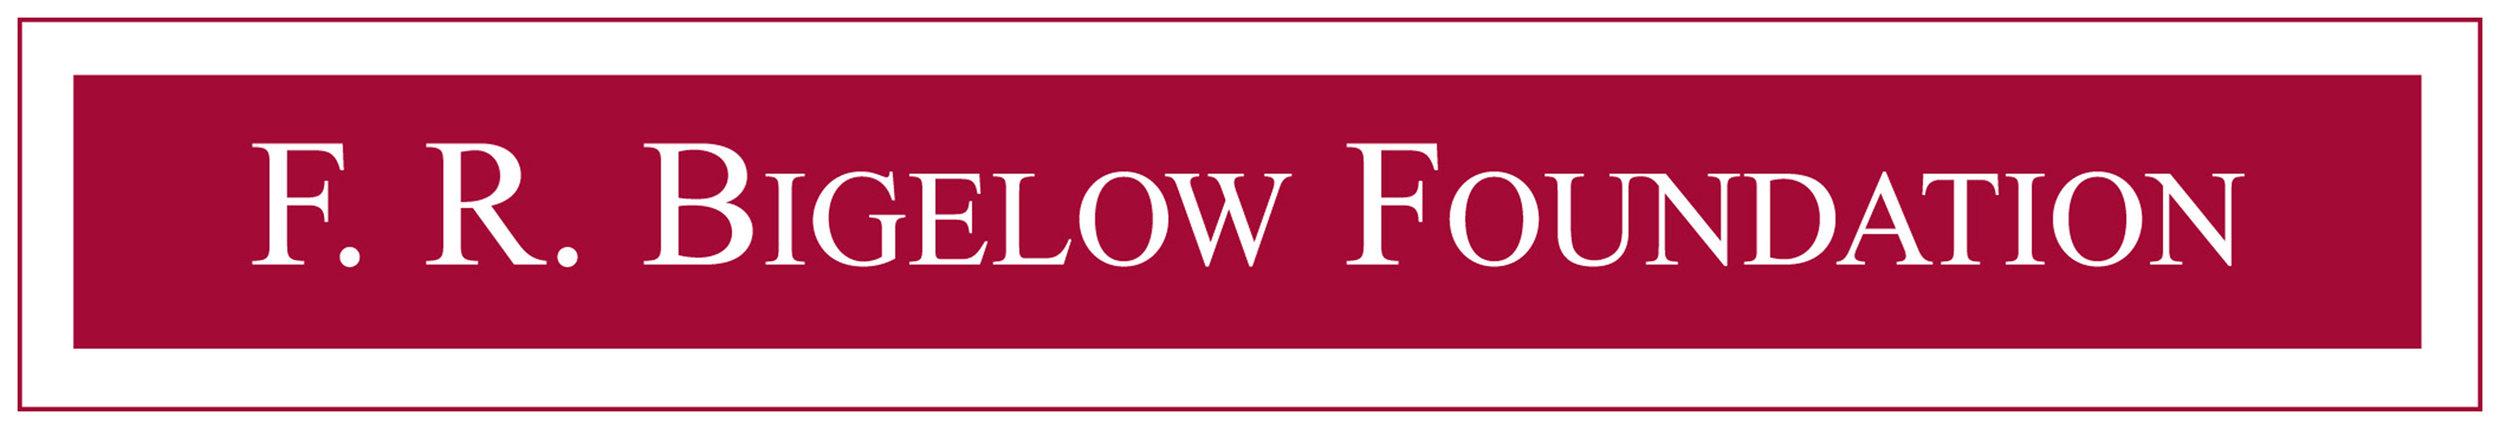 Bigelow-Foundation.jpg